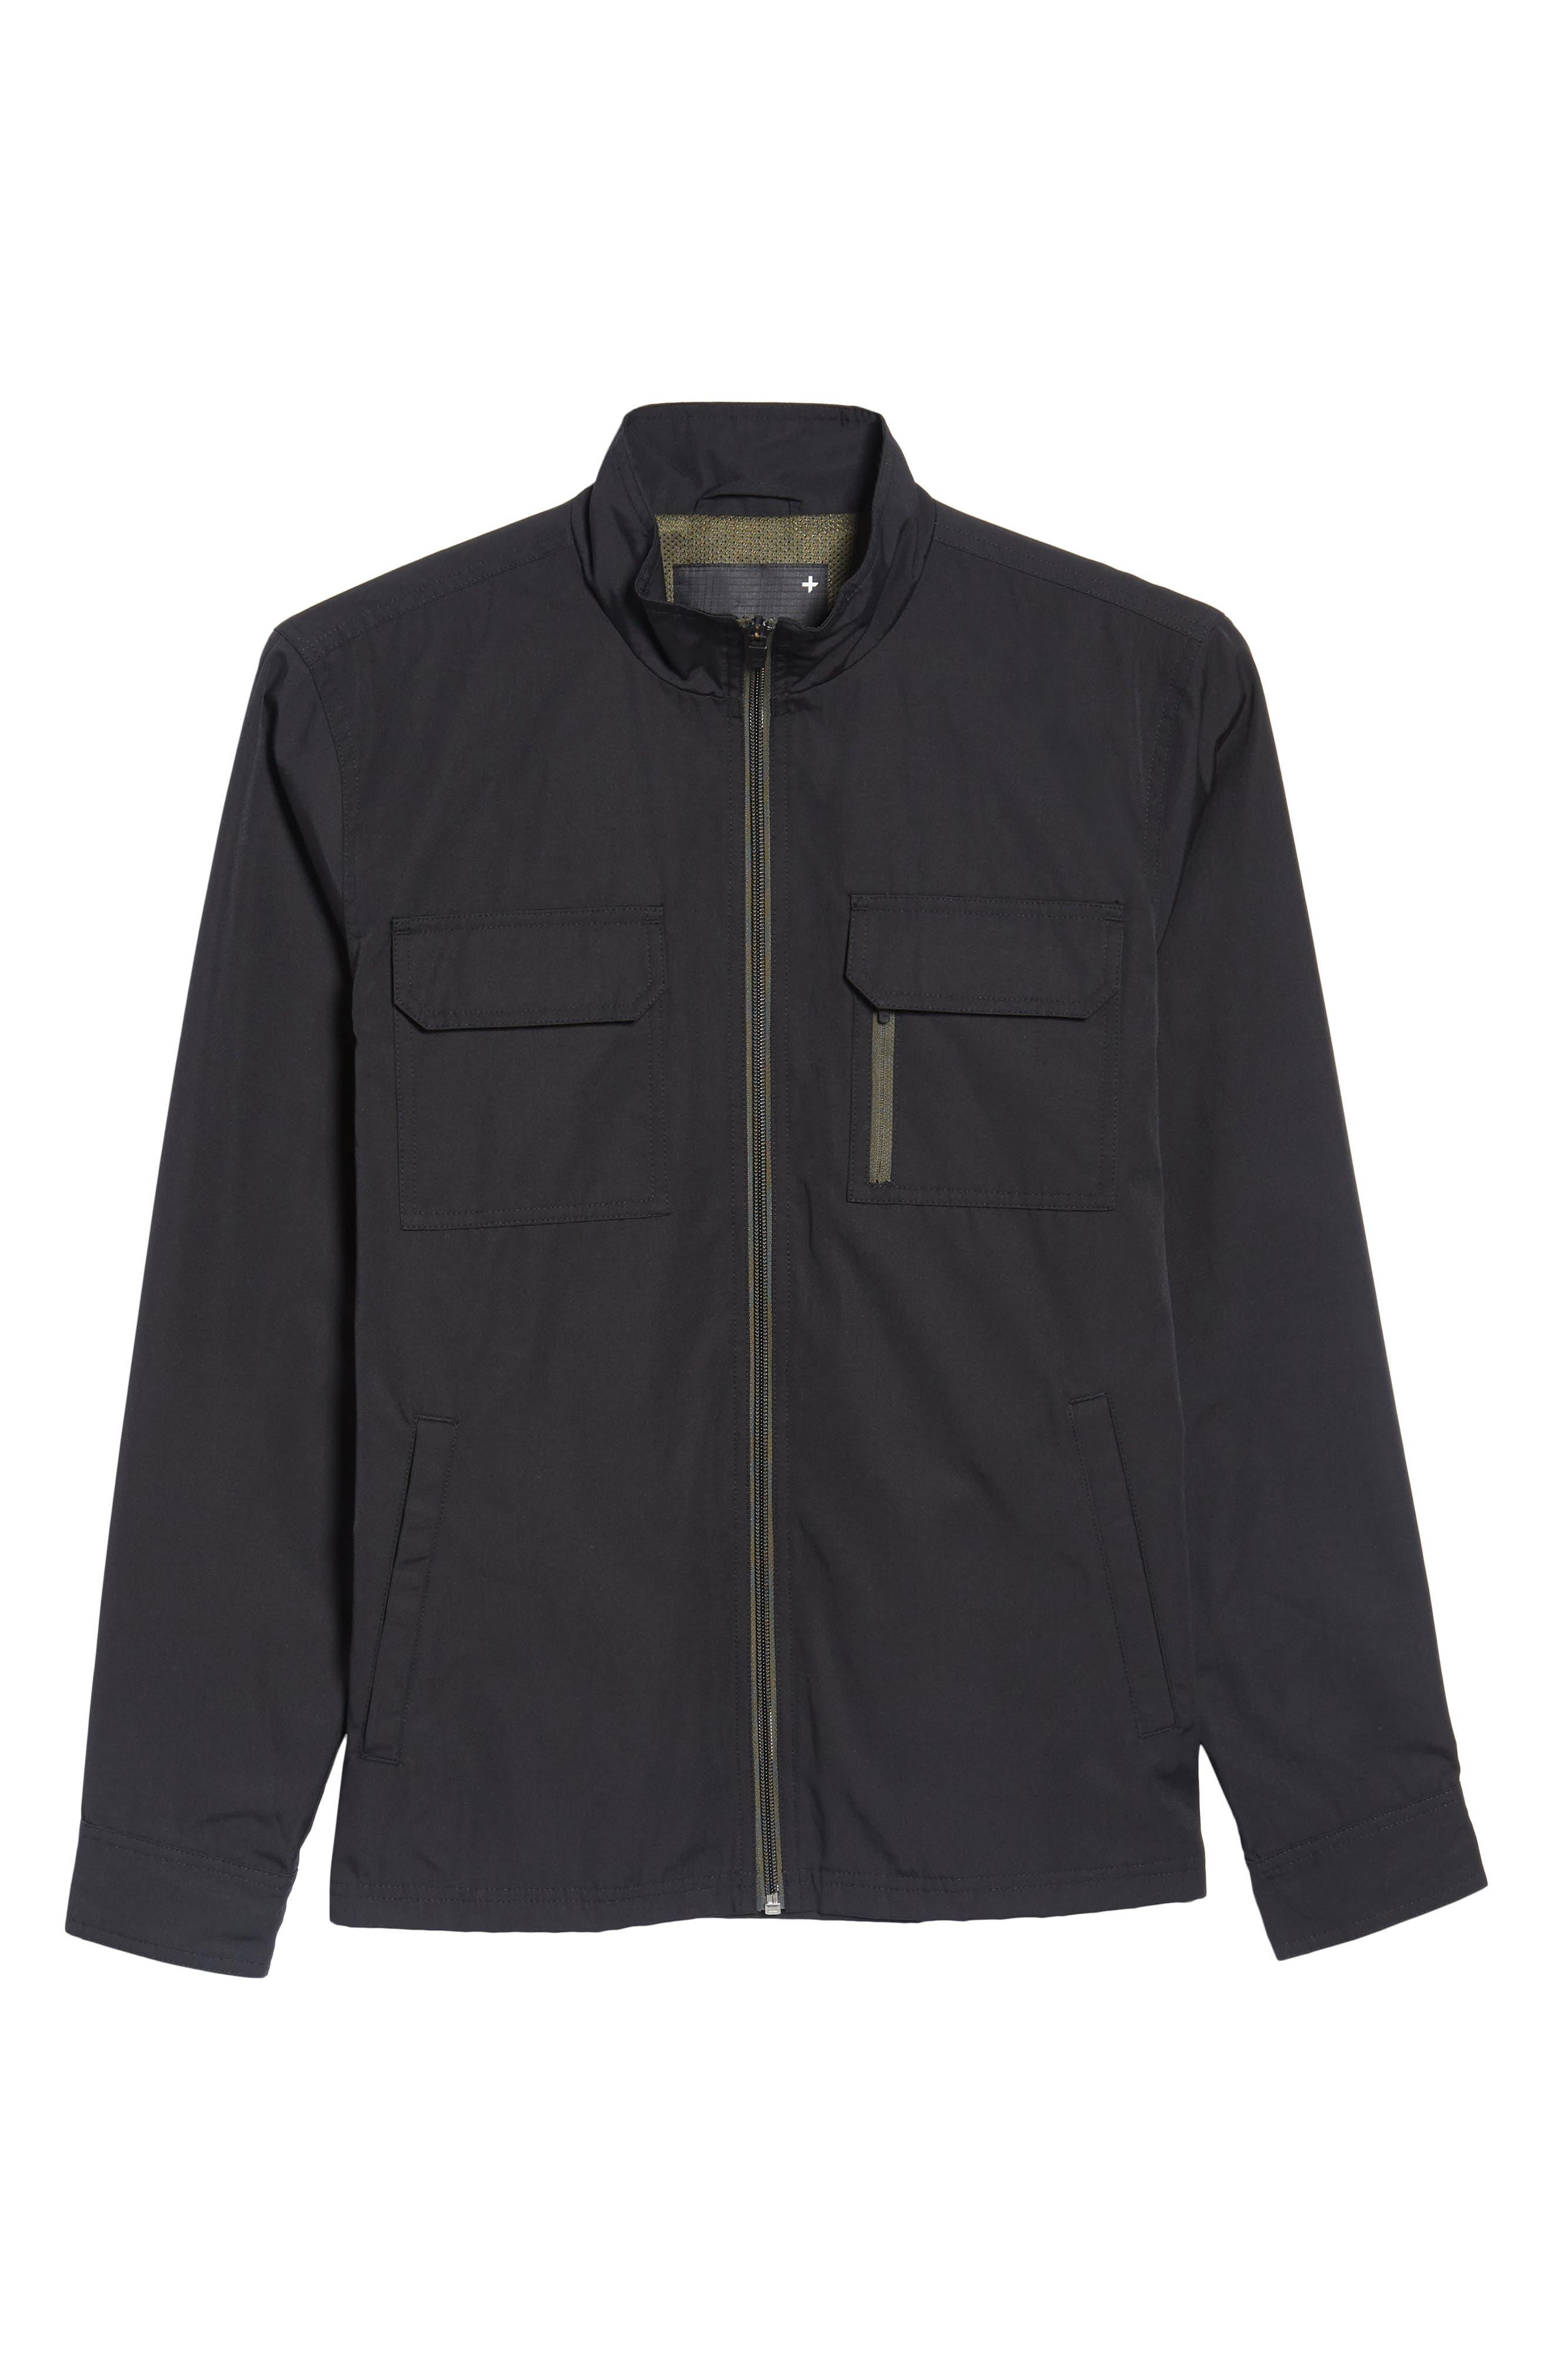 Staple Jacket,                             Alternate thumbnail 5, color,                             002